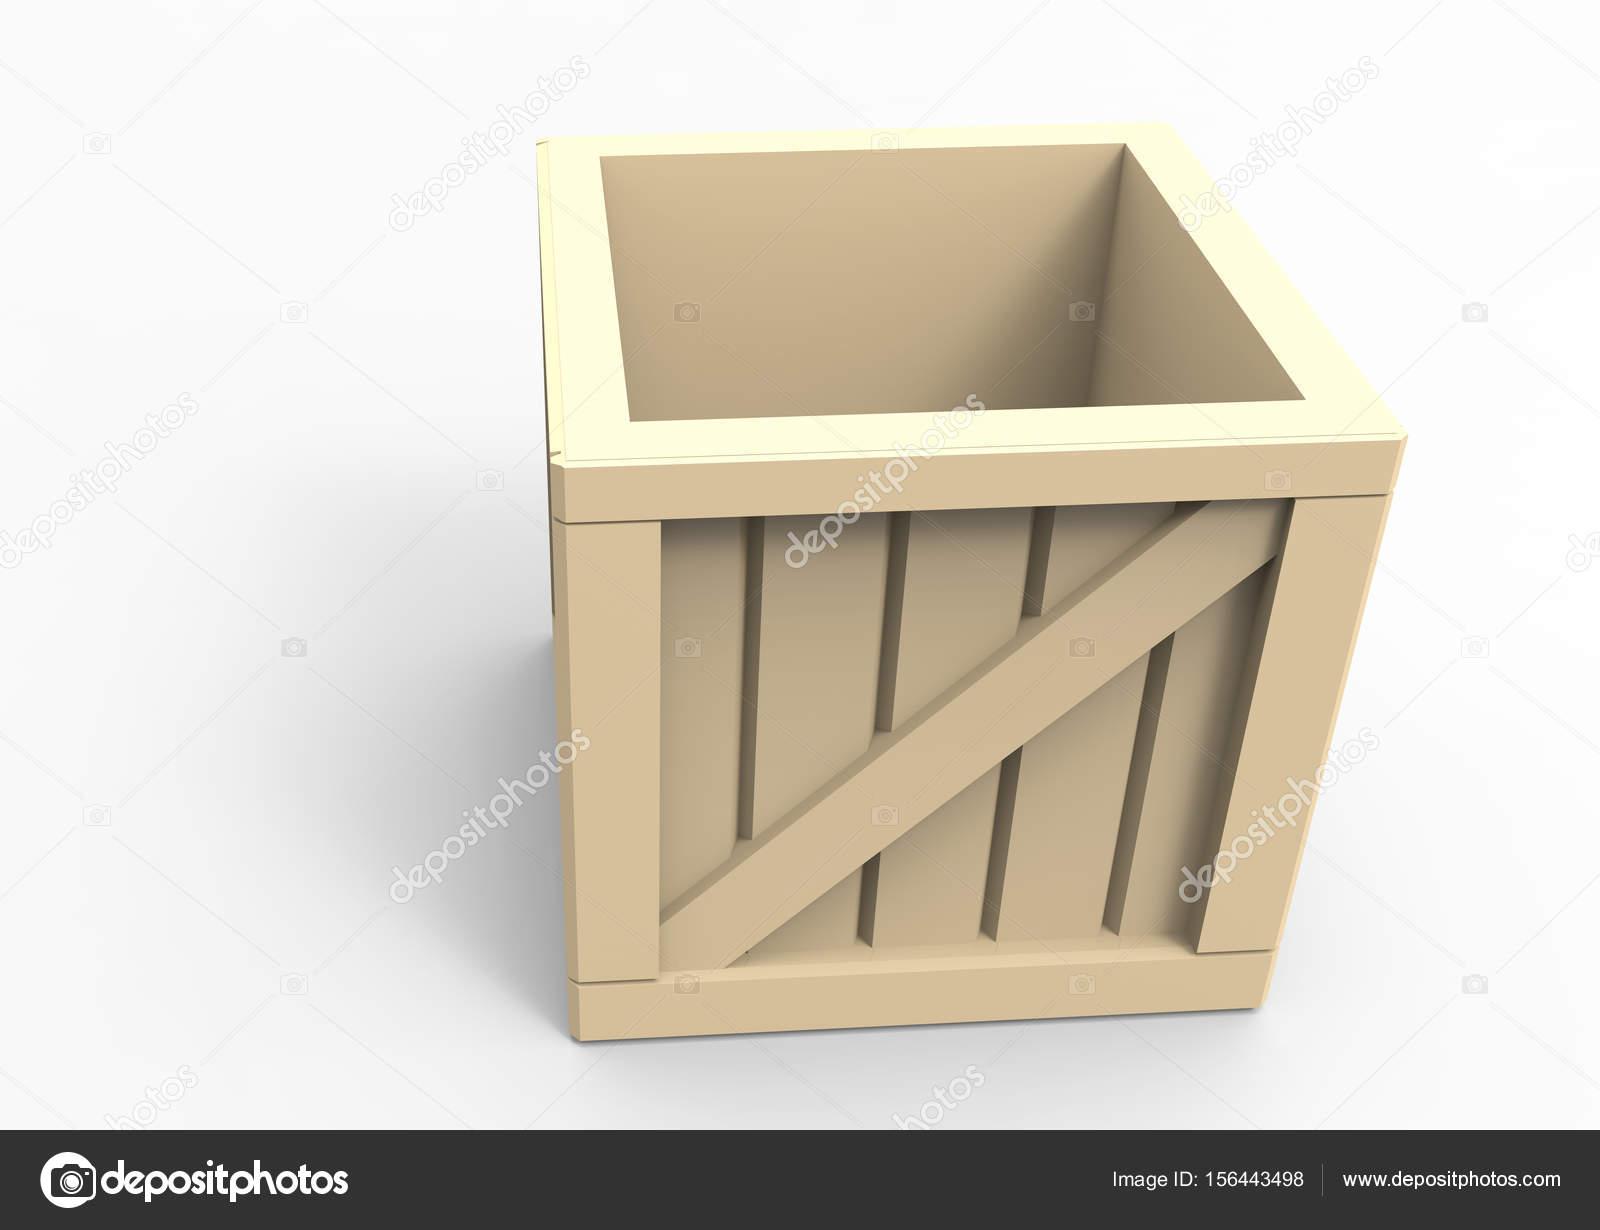 Rahmen aus Holz Box 3d — Stockfoto © blankvoid #156443498